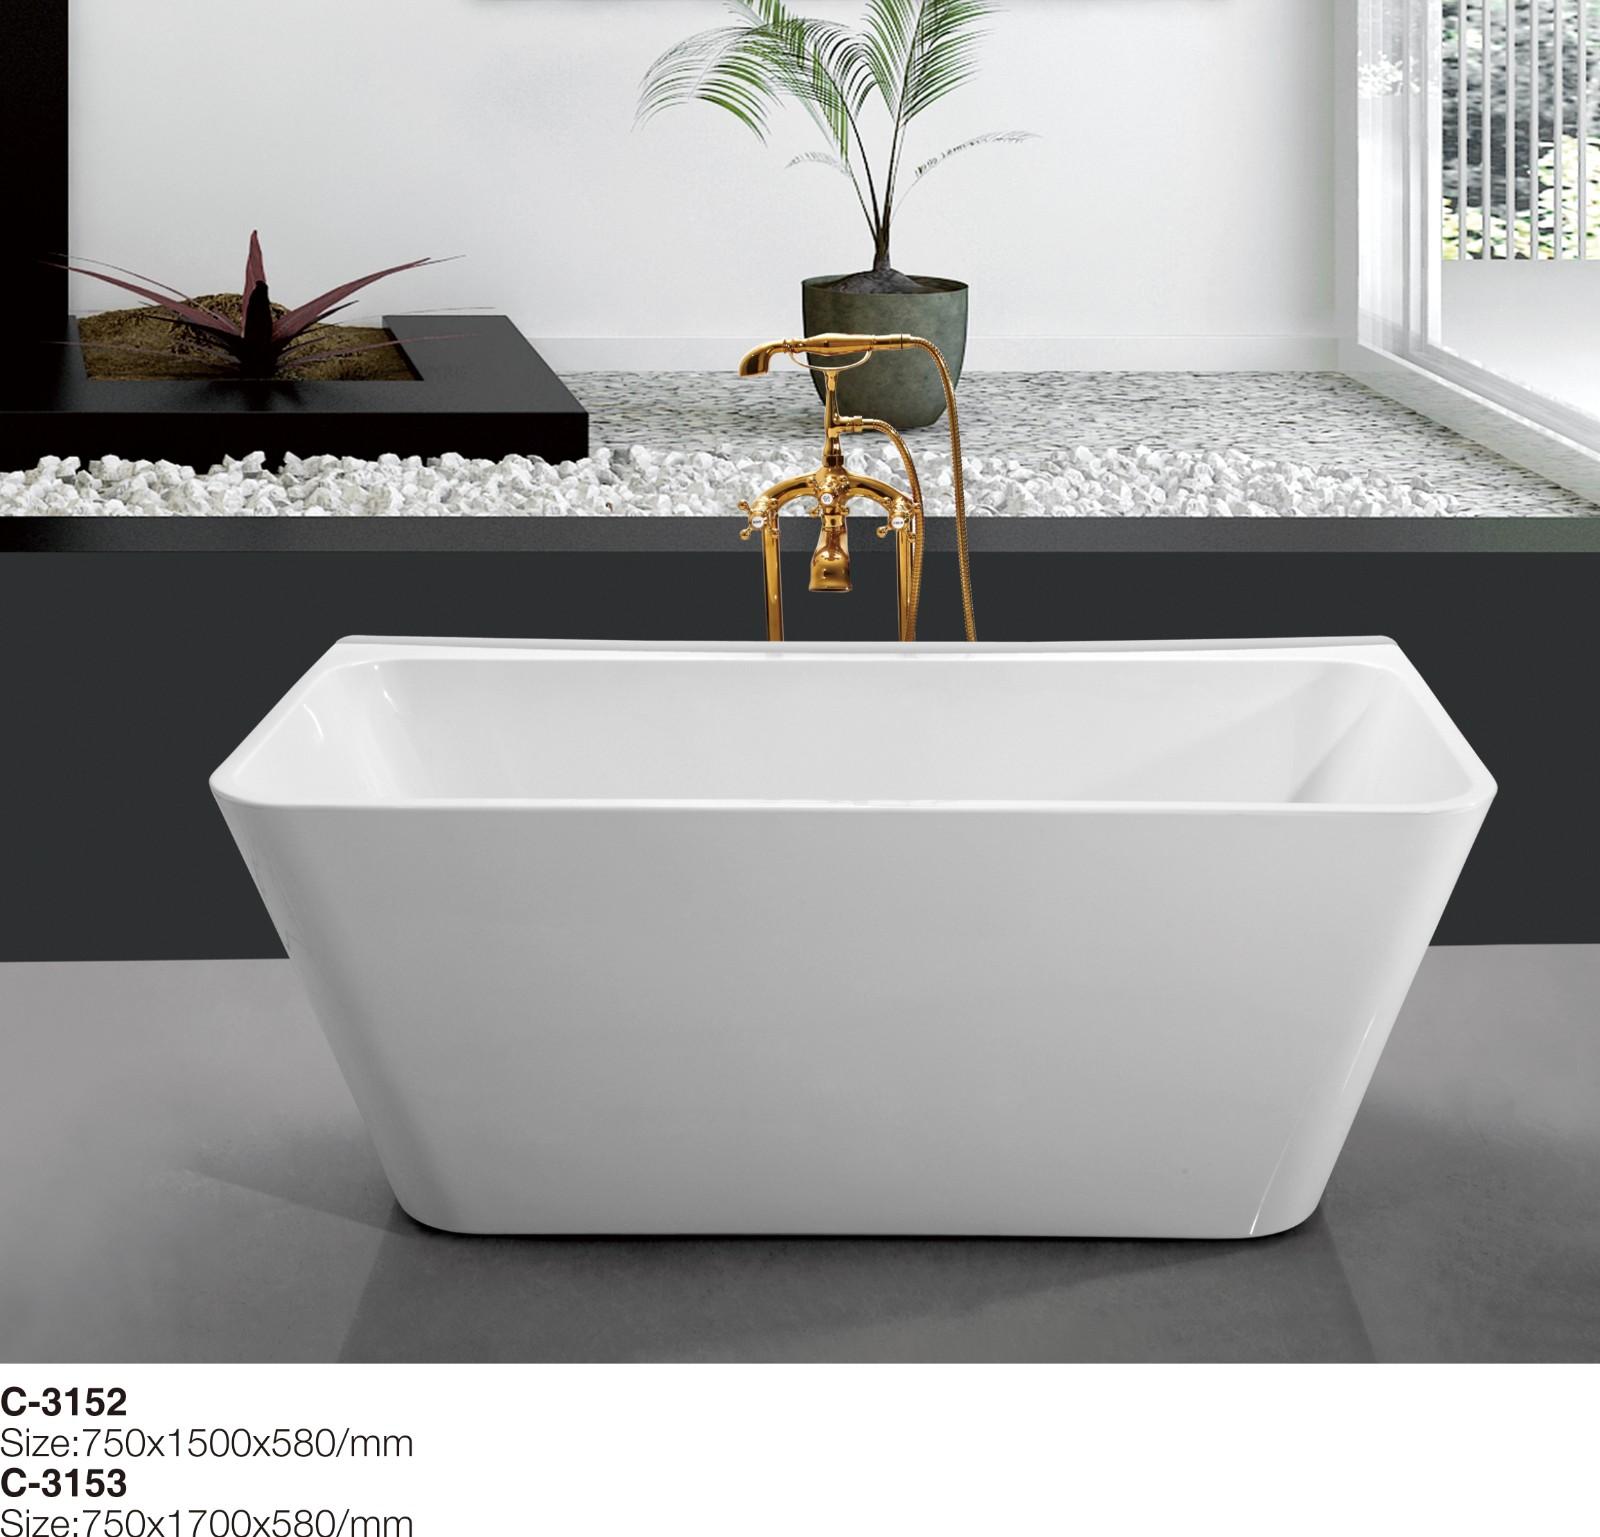 (1)C-3152 C-3153--Double Slipped Rectangular Stand Alone Acrylic Bathtub, White 67.jpg